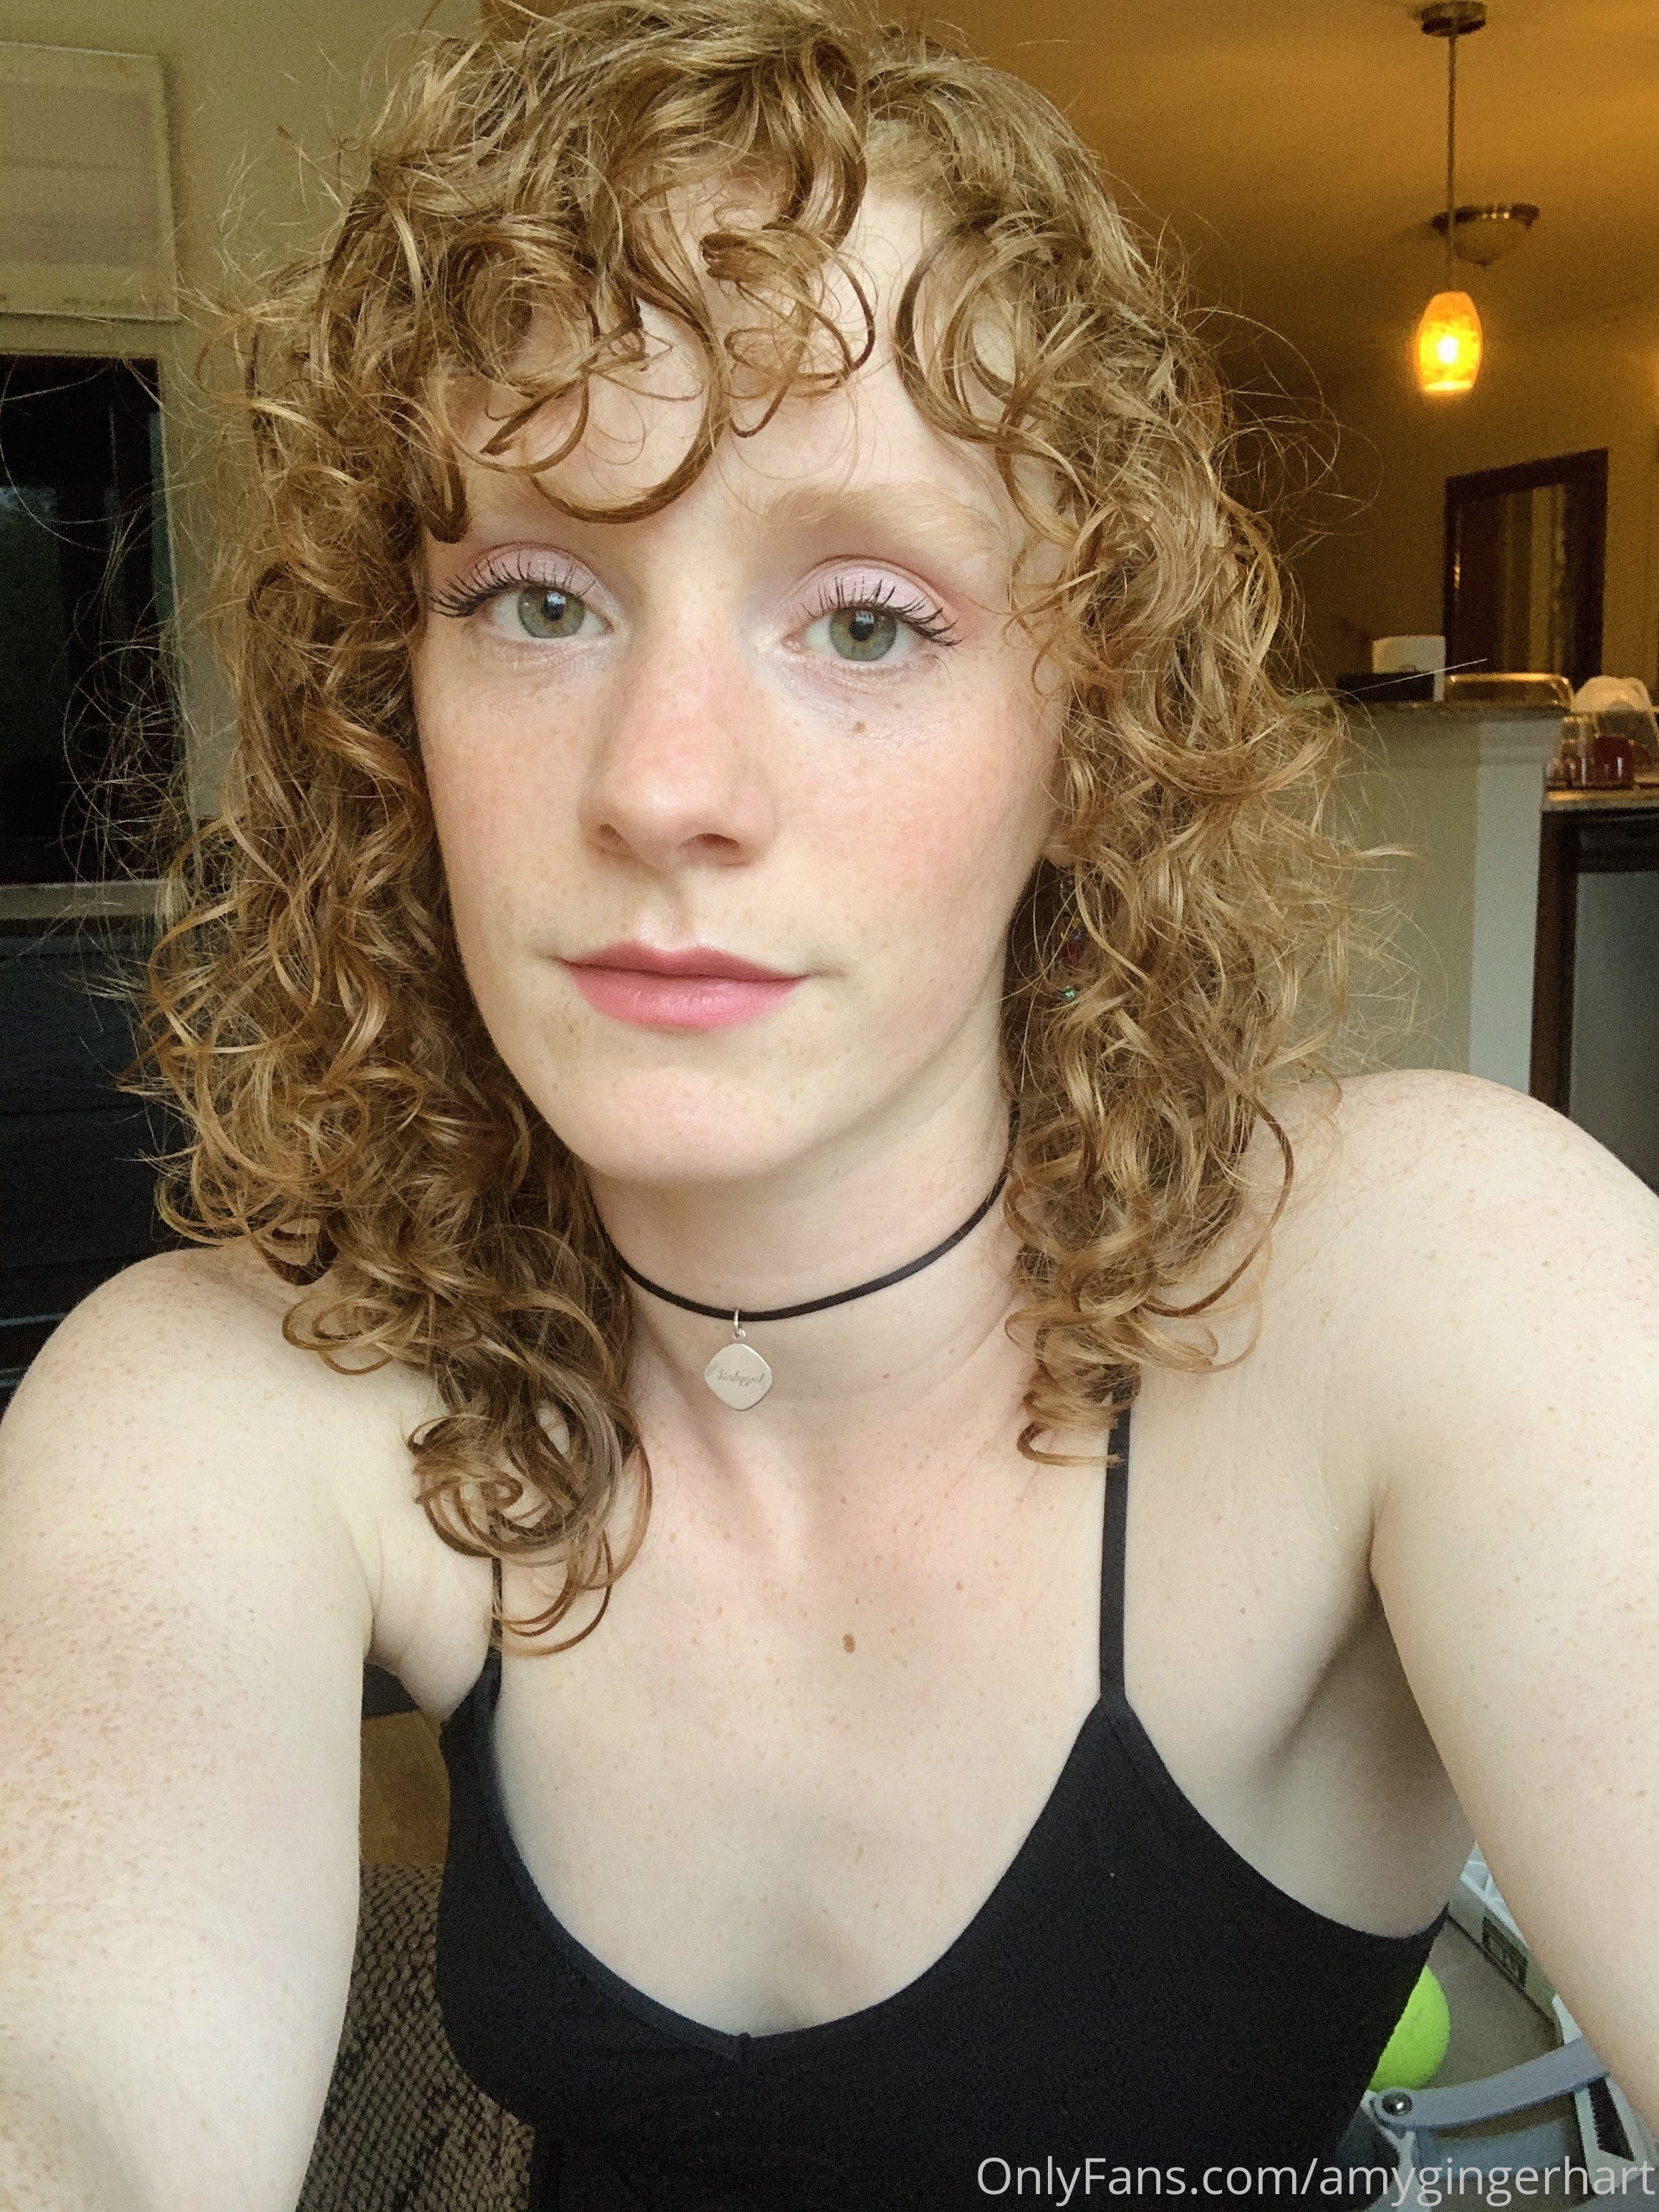 Amy Hart, Amygingerhart, Onlyfans 0348